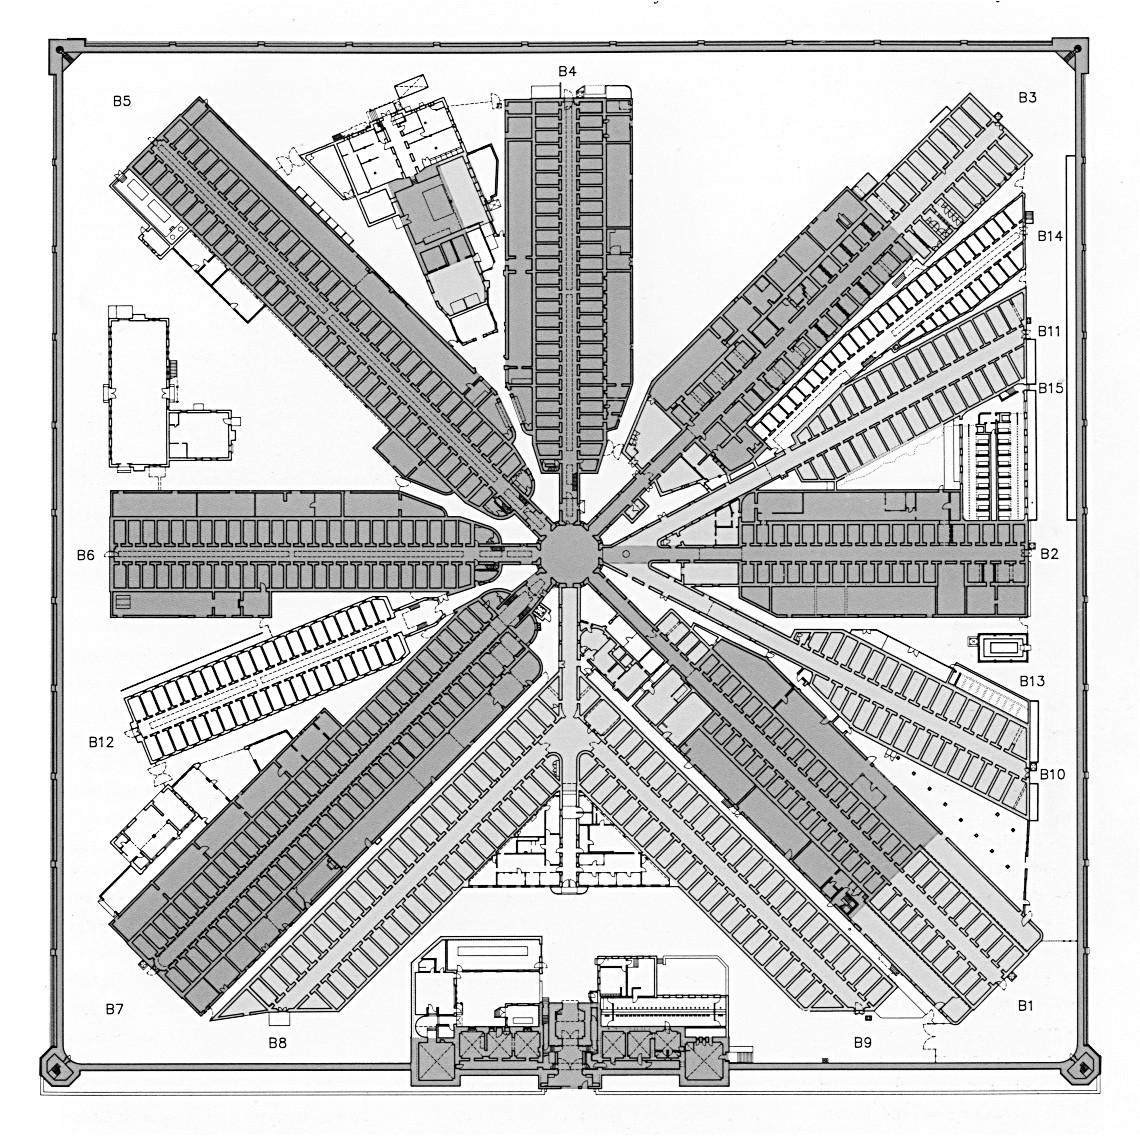 prison floorplans